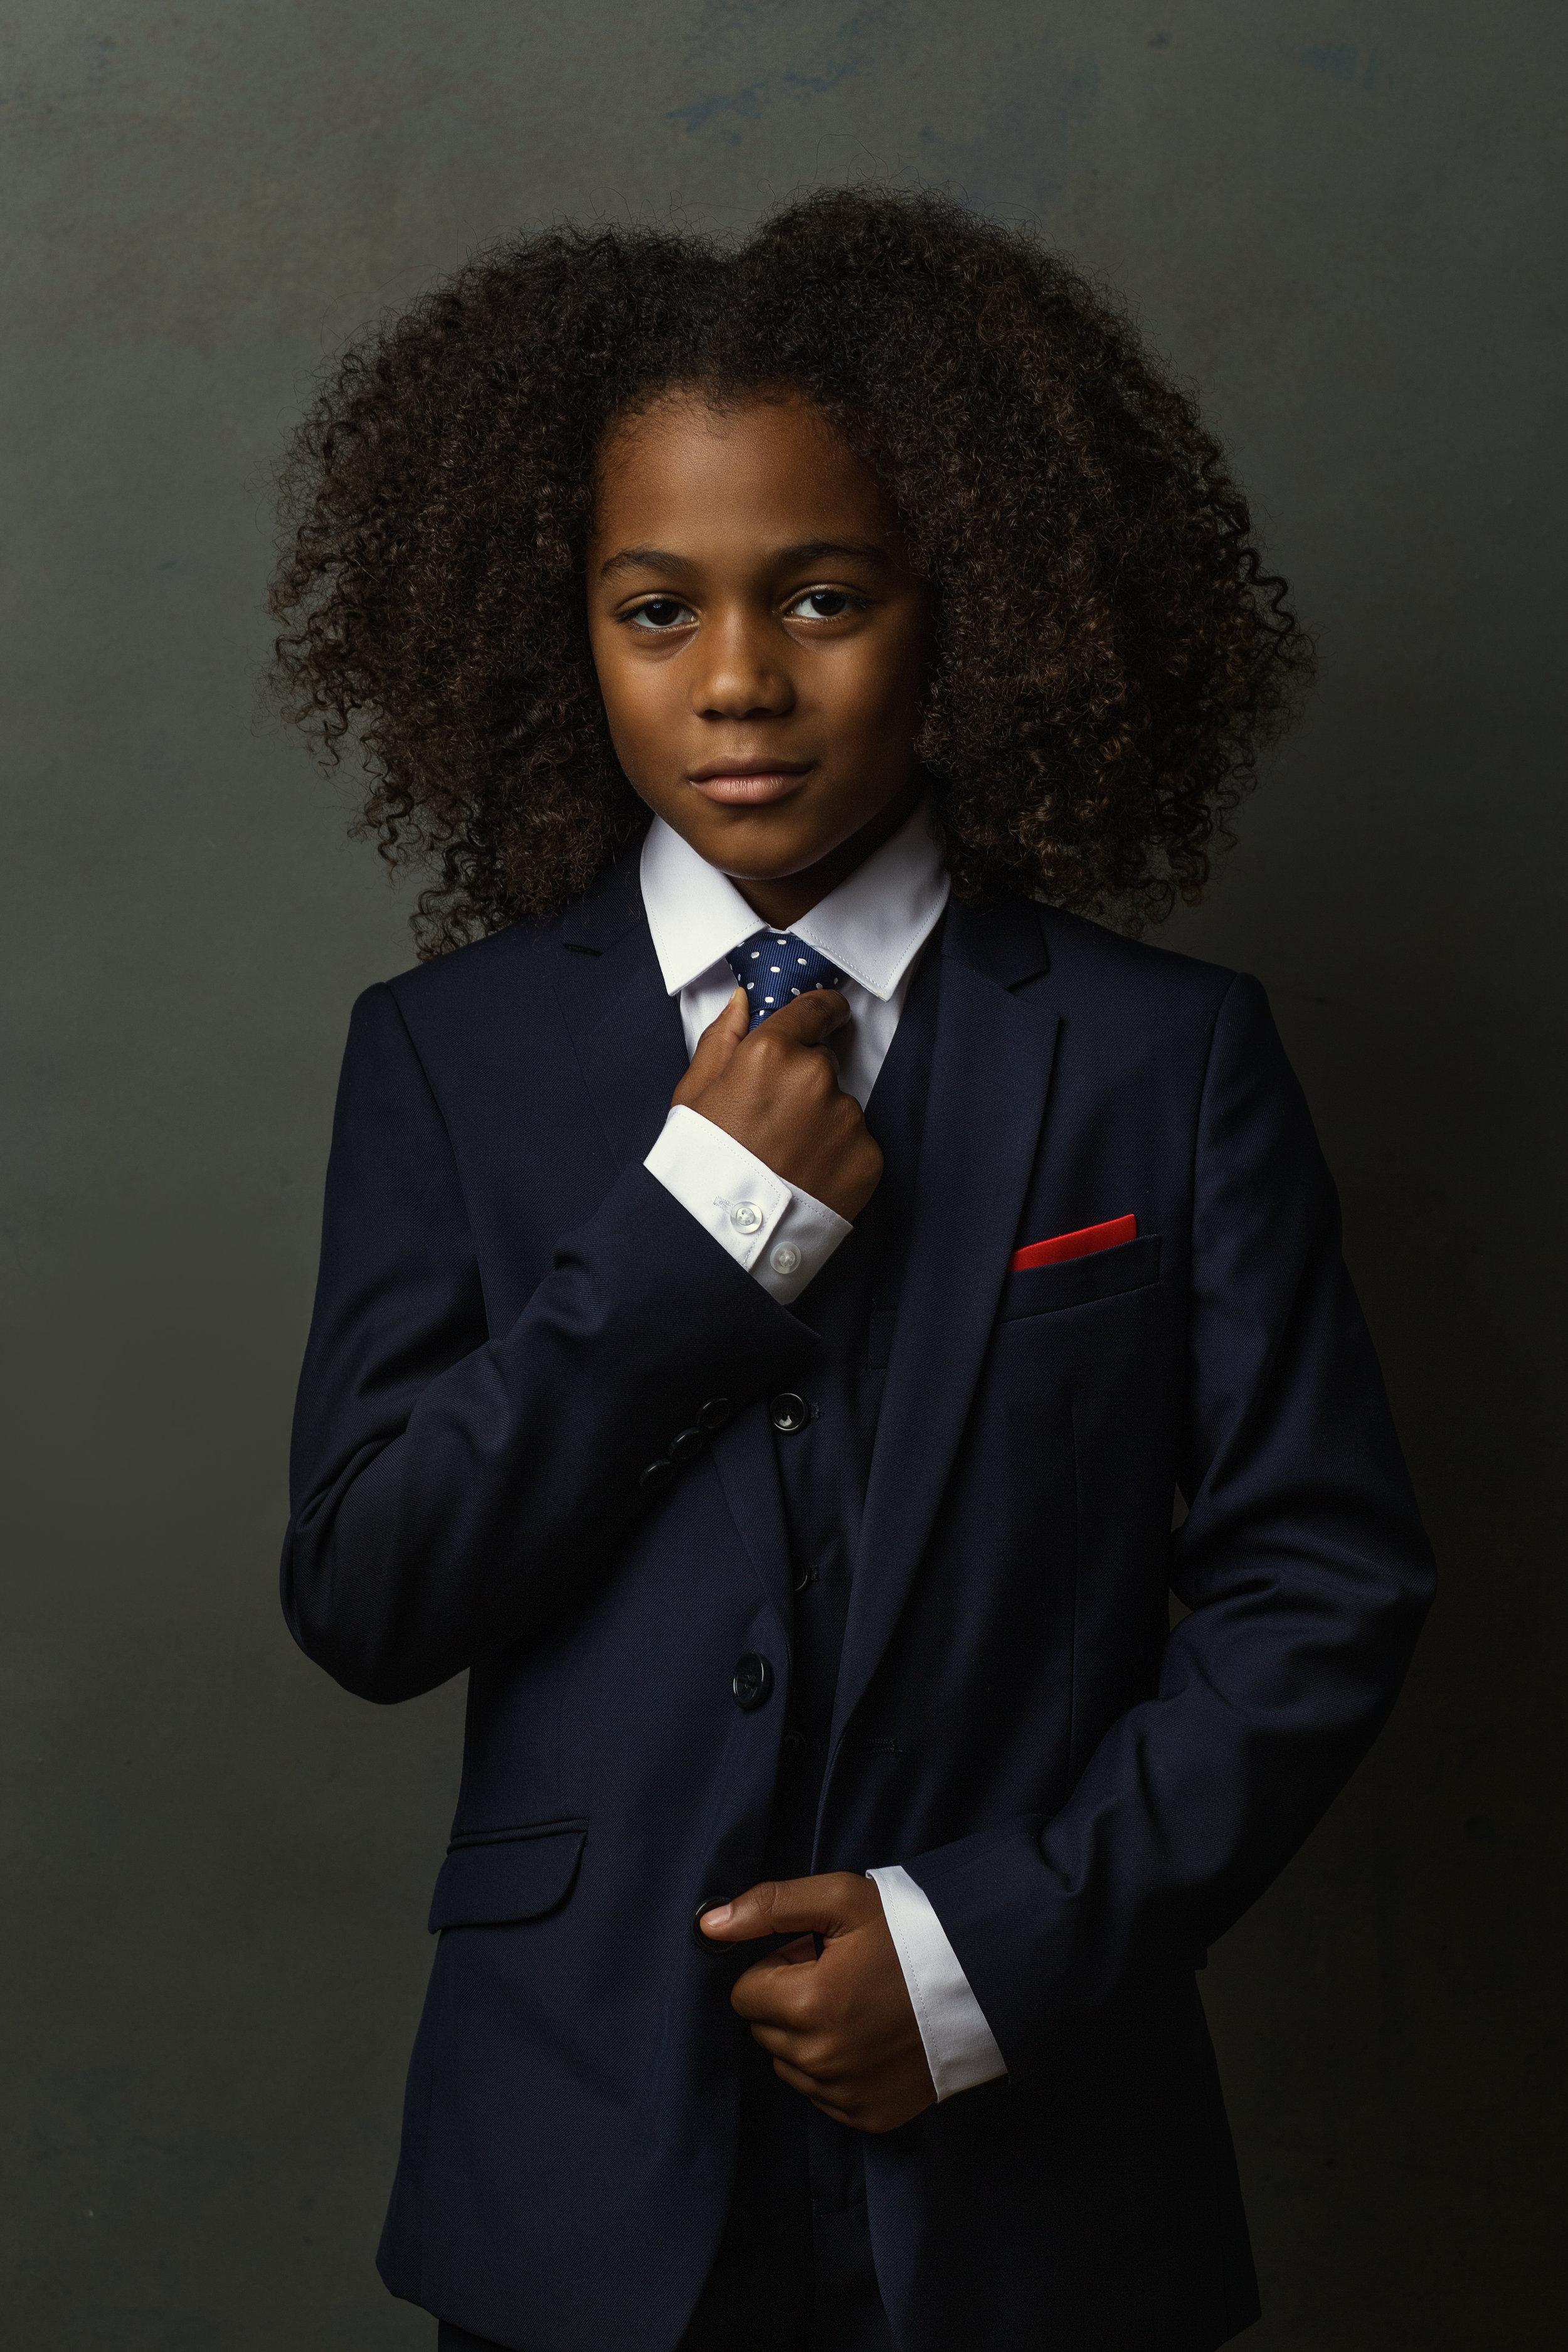 Atlanta-Georgia-Kids Portraits-Ria Rouse Photography Jeremiah-2.jpg